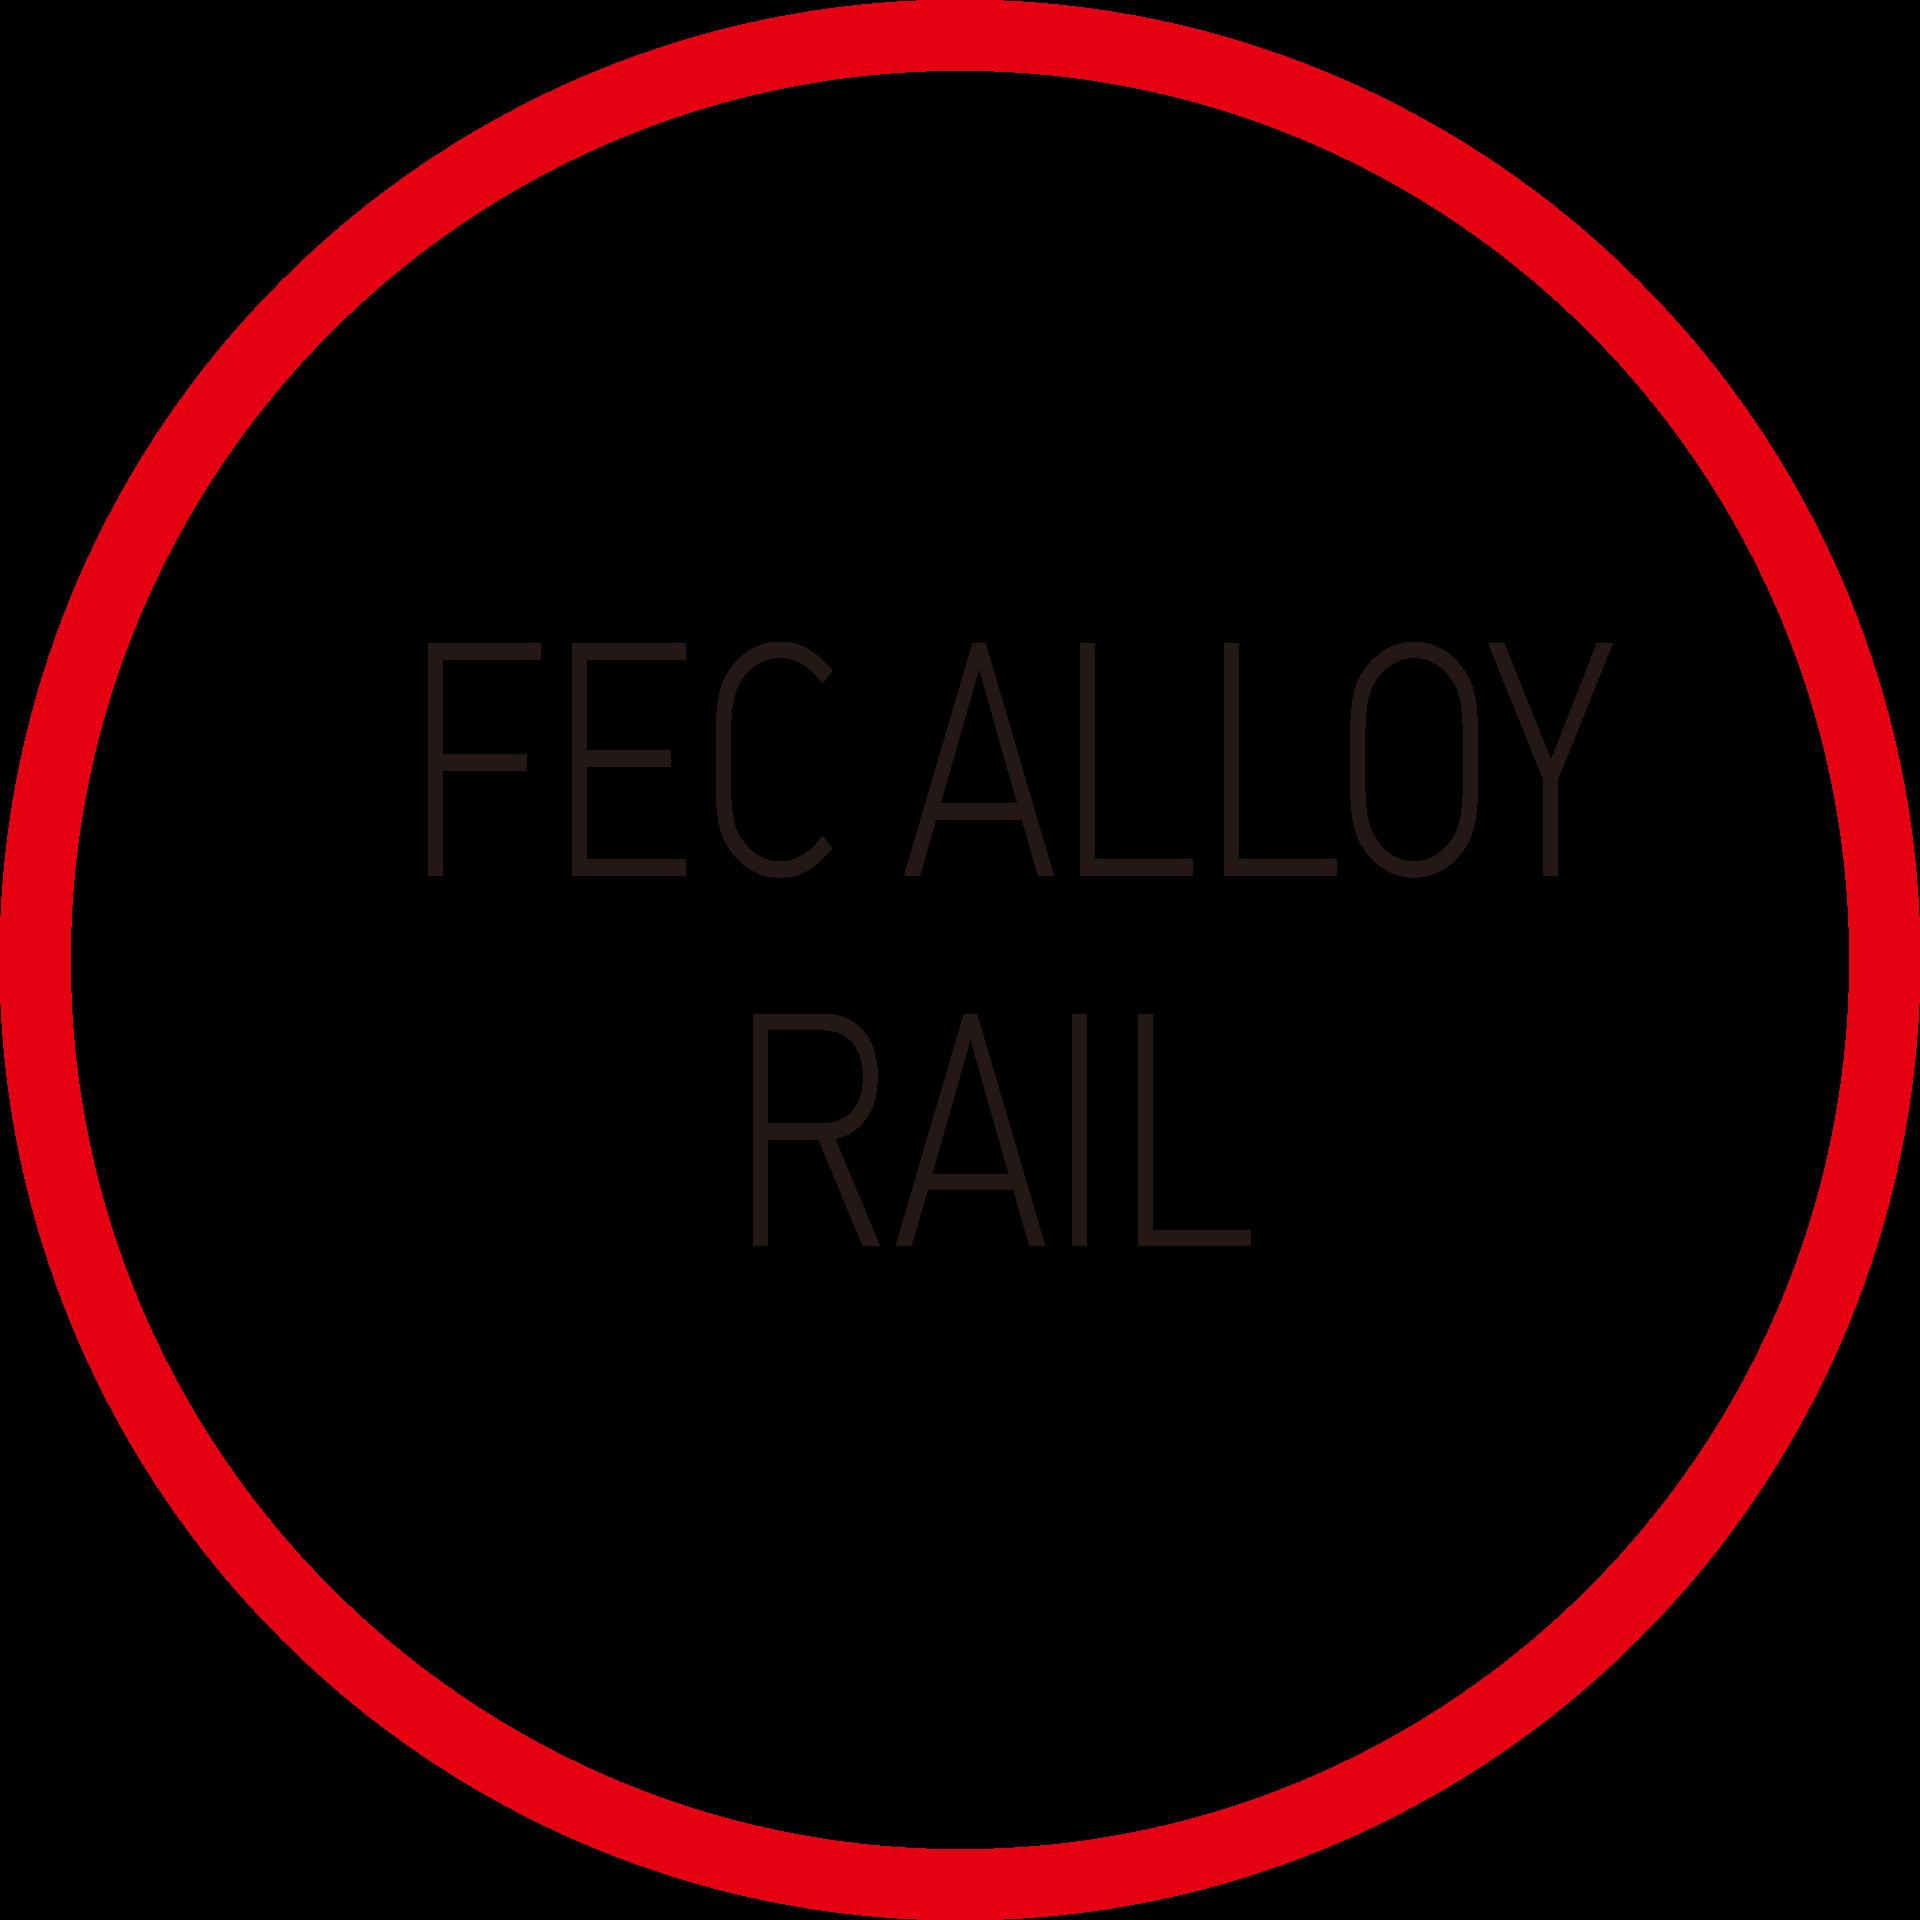 Selle-Italia-material-Fec-Alloy-Rail